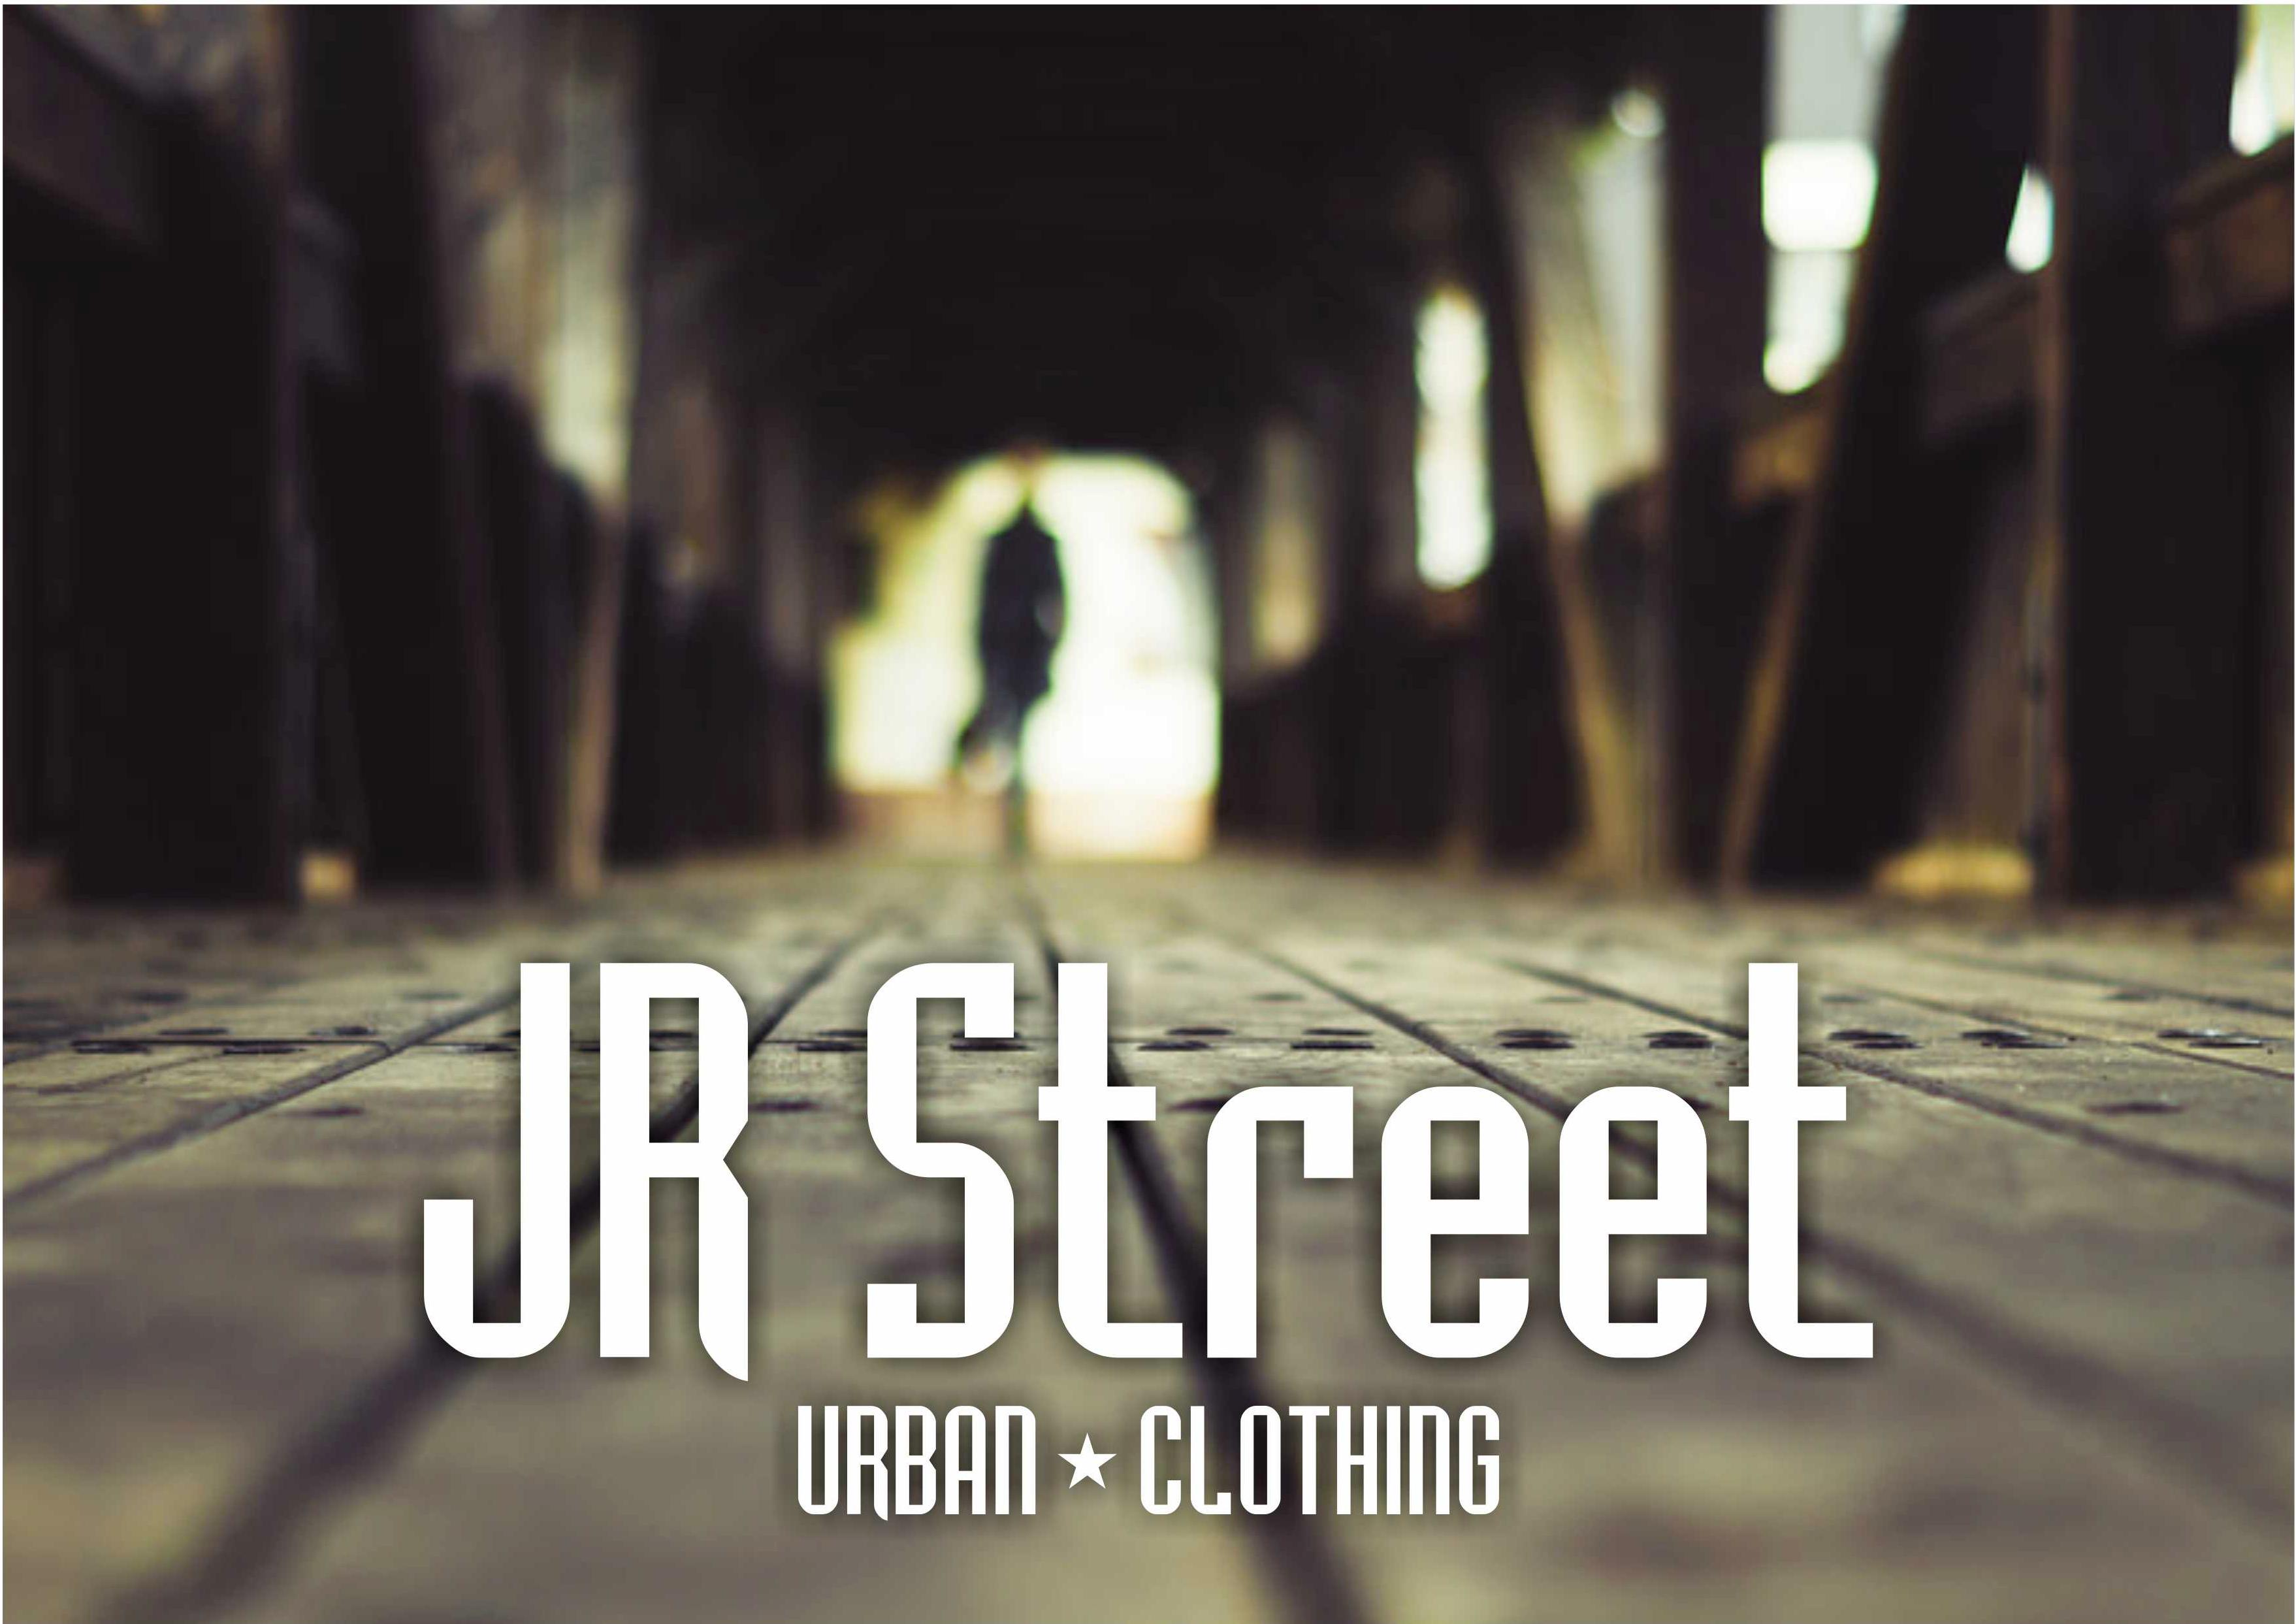 J. Rodino Street